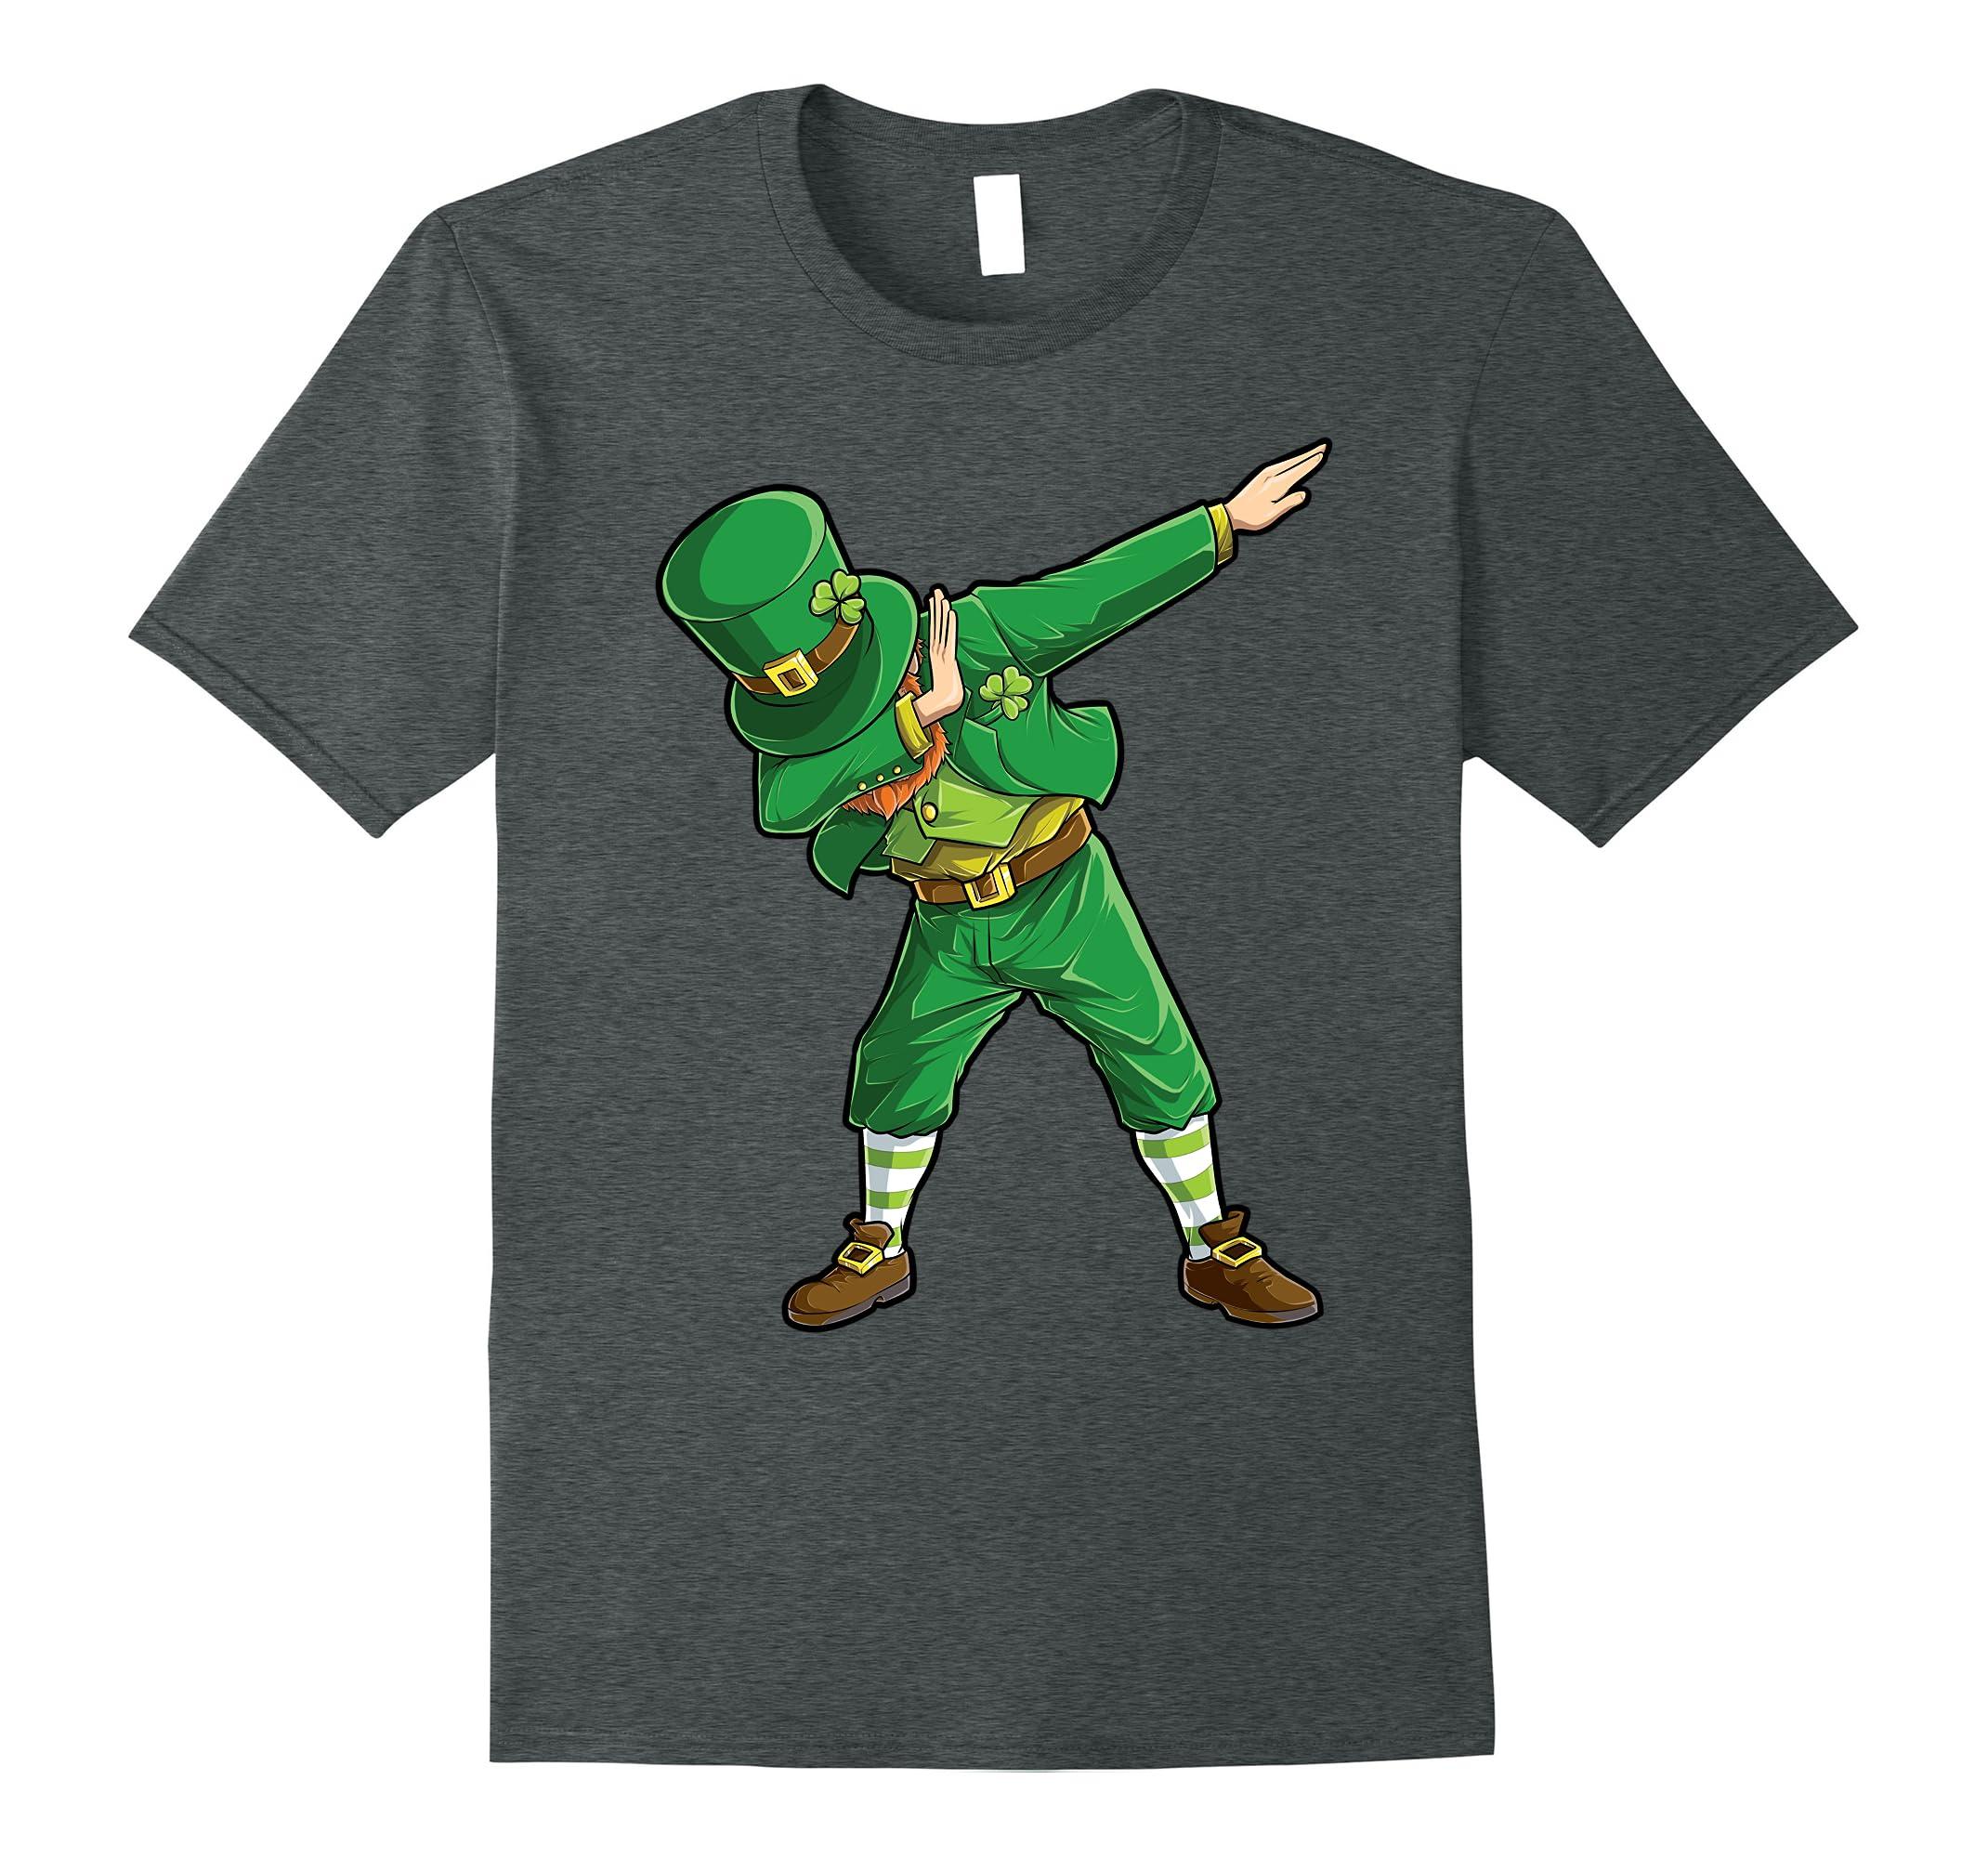 db508ef23 Dabbing Leprechaun T shirt Funny Dab St Patricks Day Gift-ah my shirt one  gift